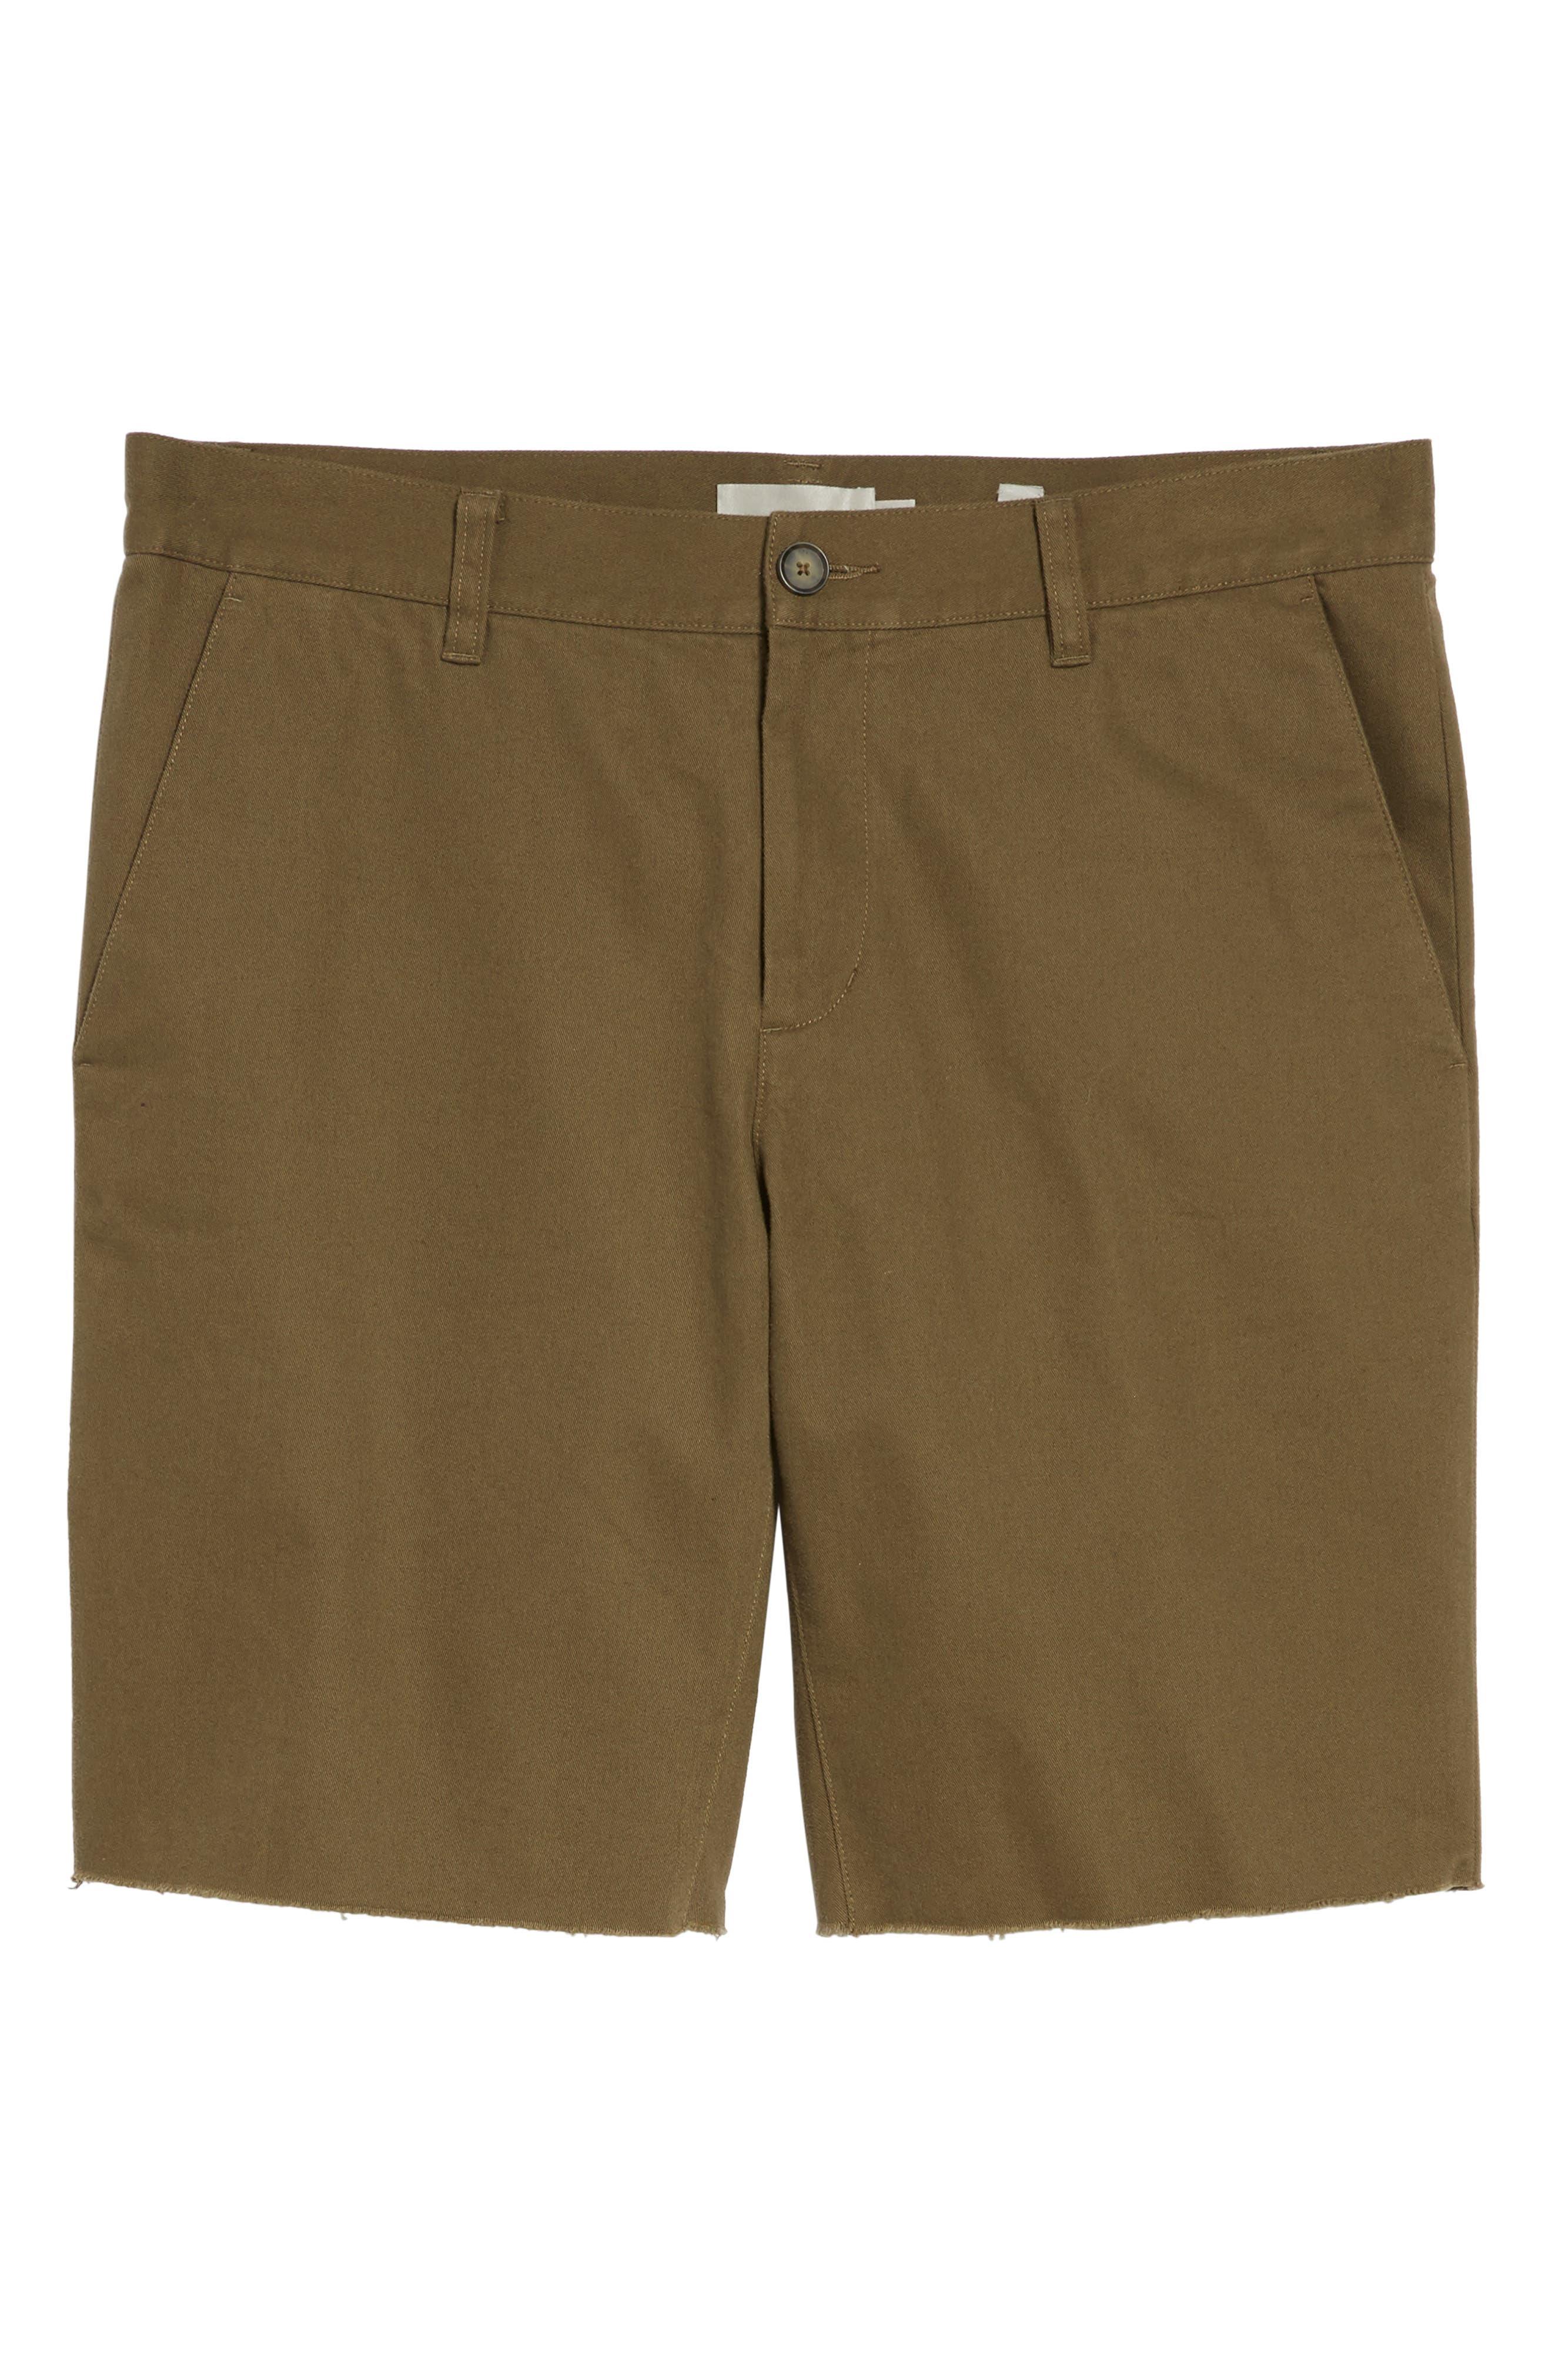 Slim Fit Chino Shorts,                             Alternate thumbnail 6, color,                             Camp Green